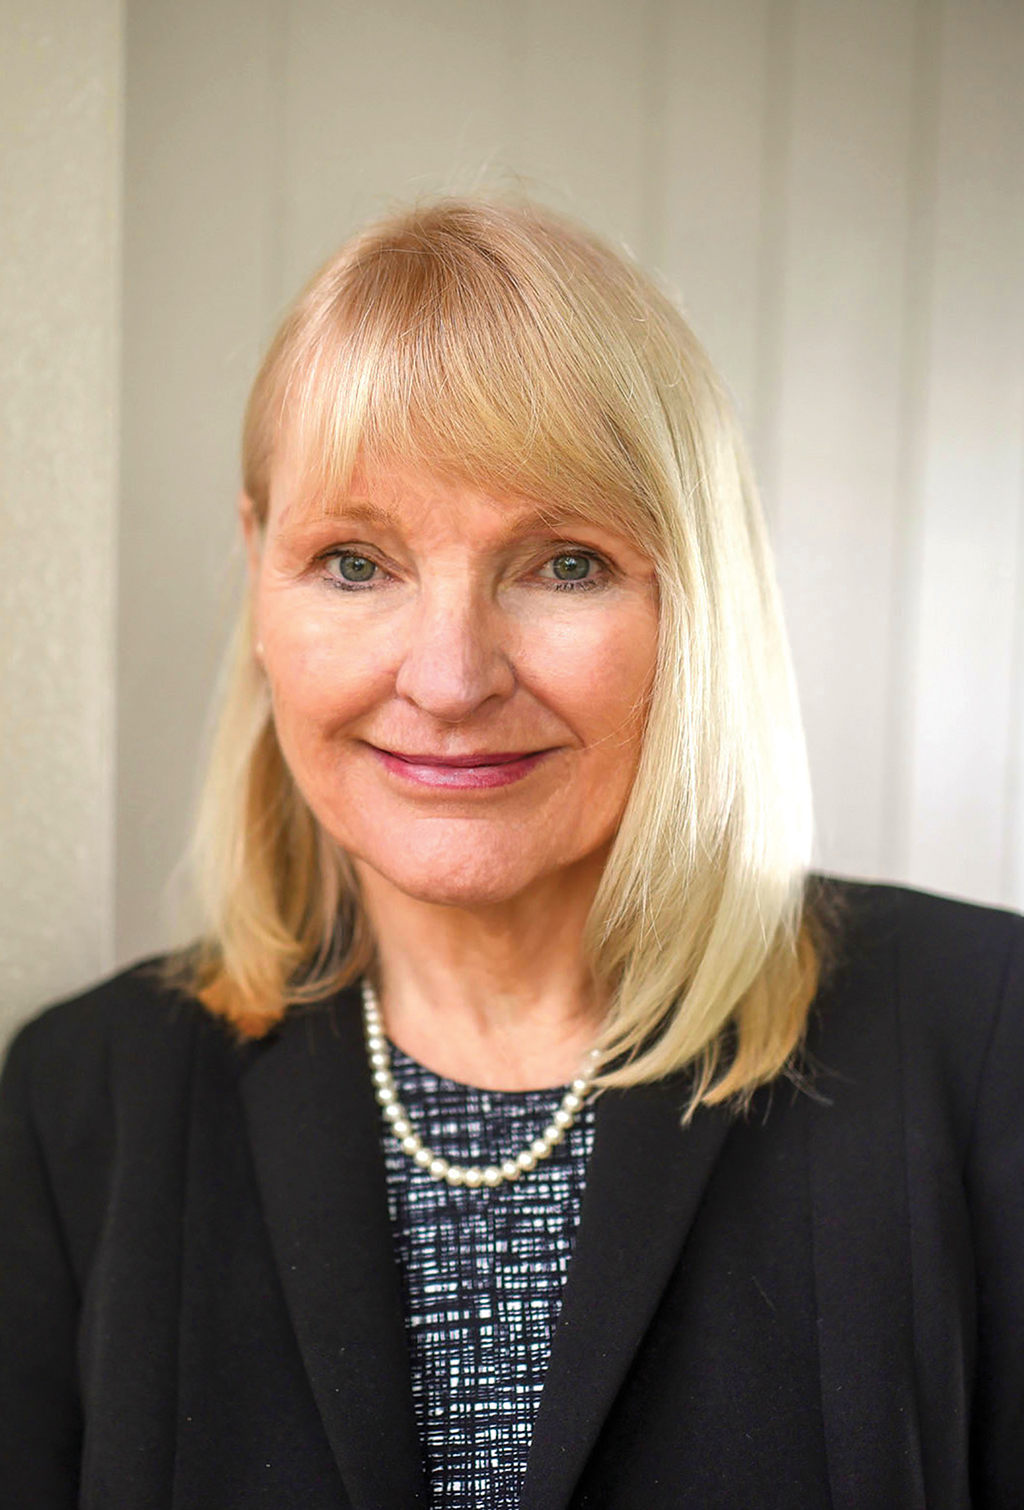 Highlands-Cashiers-Health-Foundation-Robin-Tindall